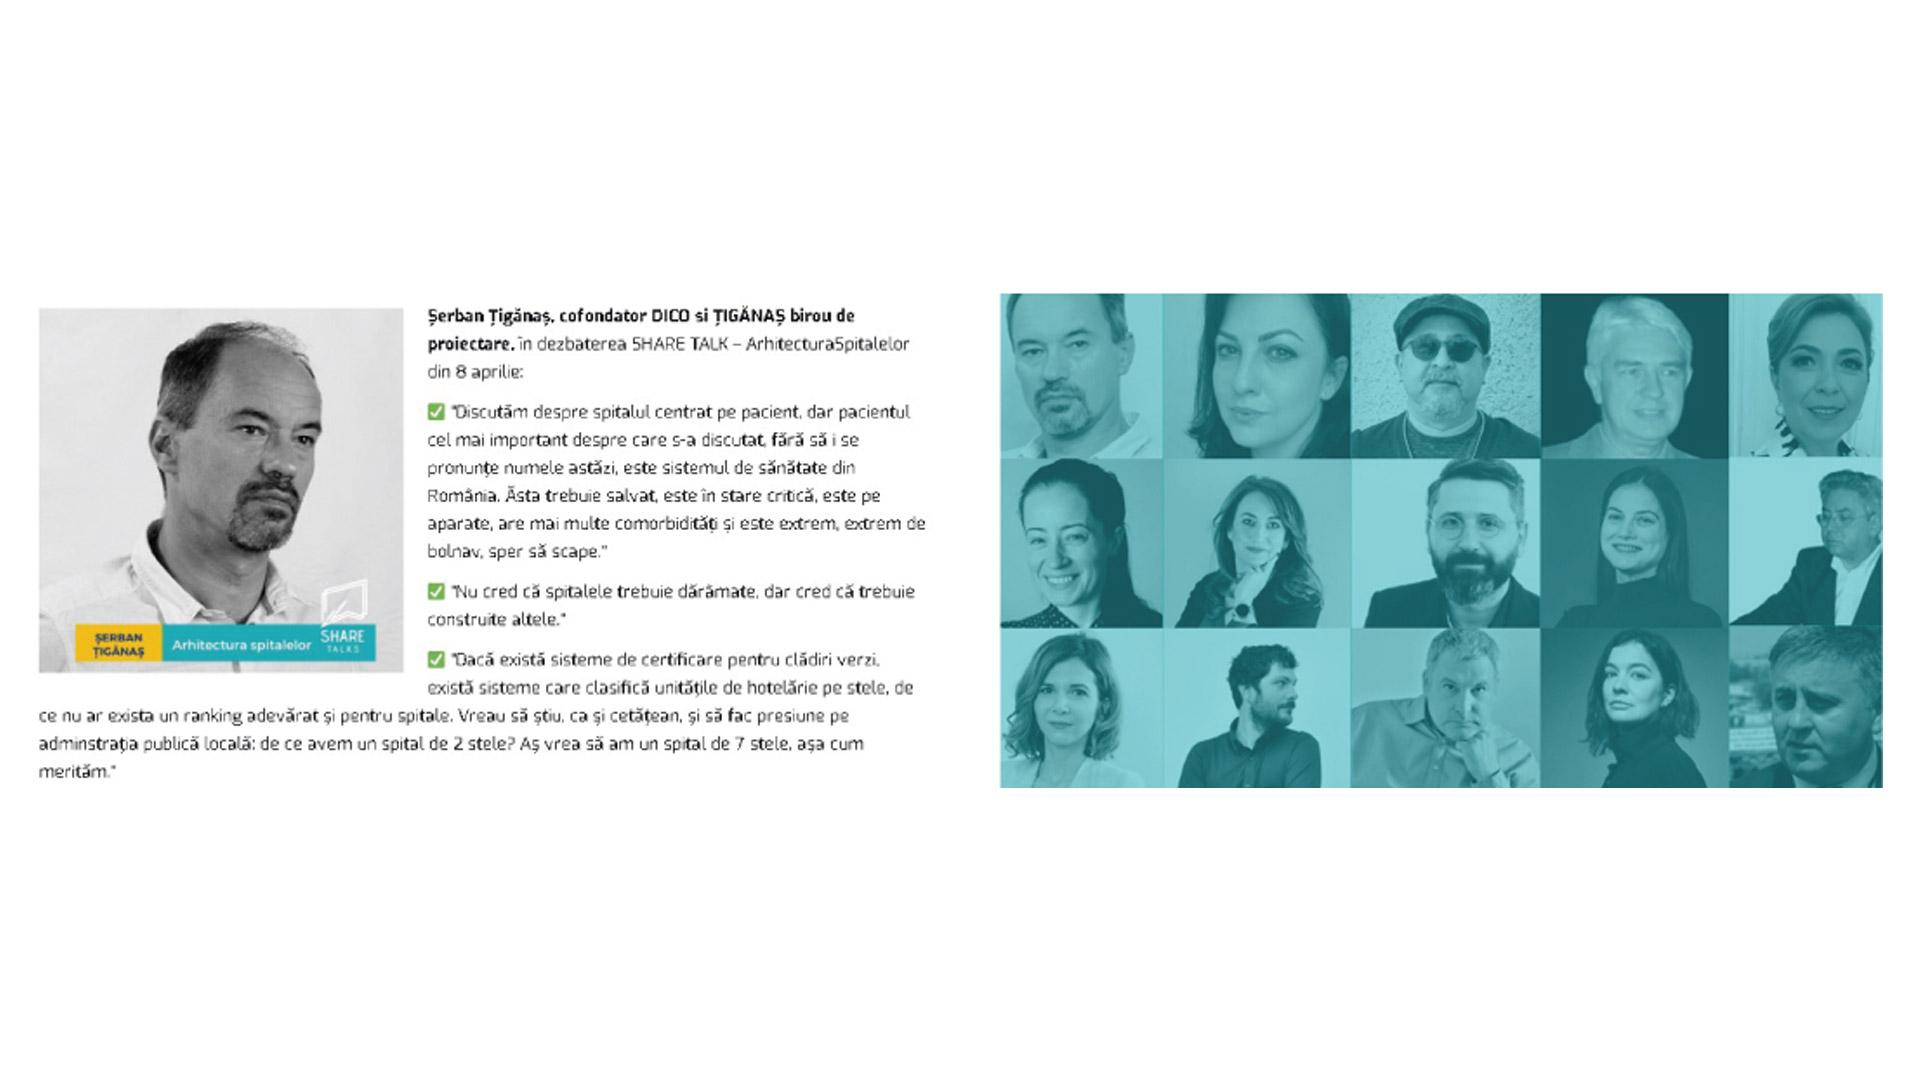 Share Arhitecture, Share Talks, Arhitectura spitalelor 2021